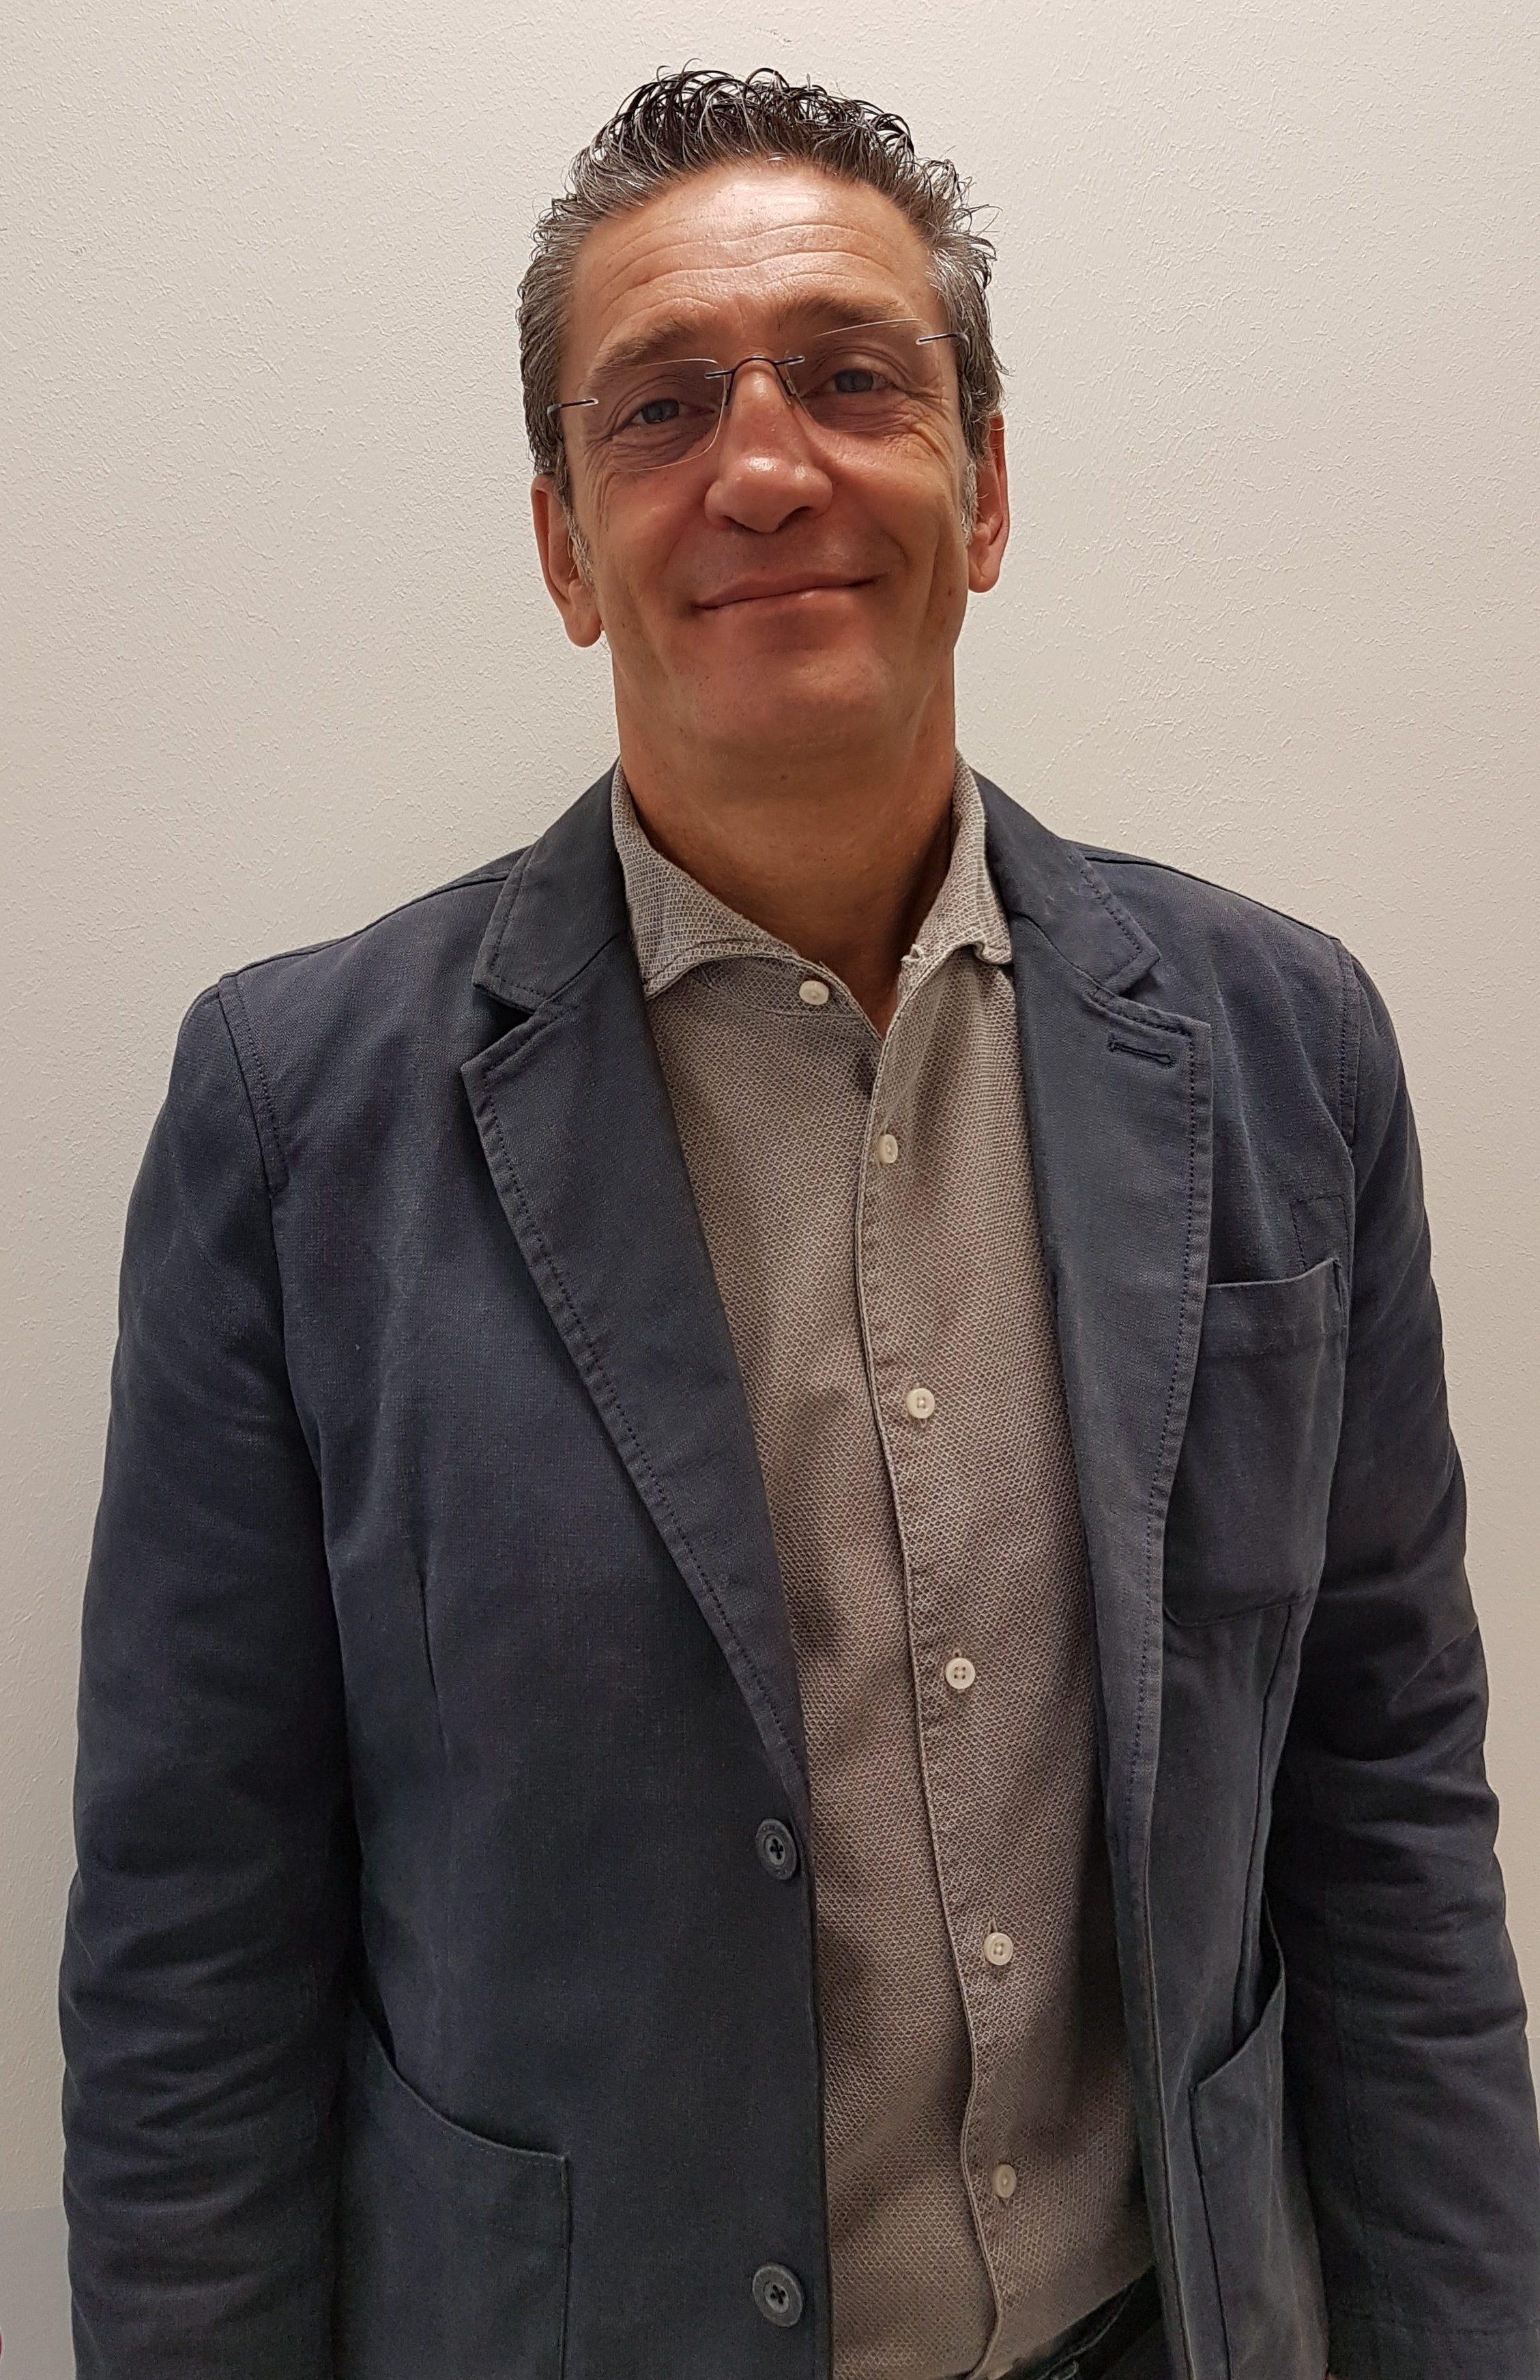 Paolo Monari